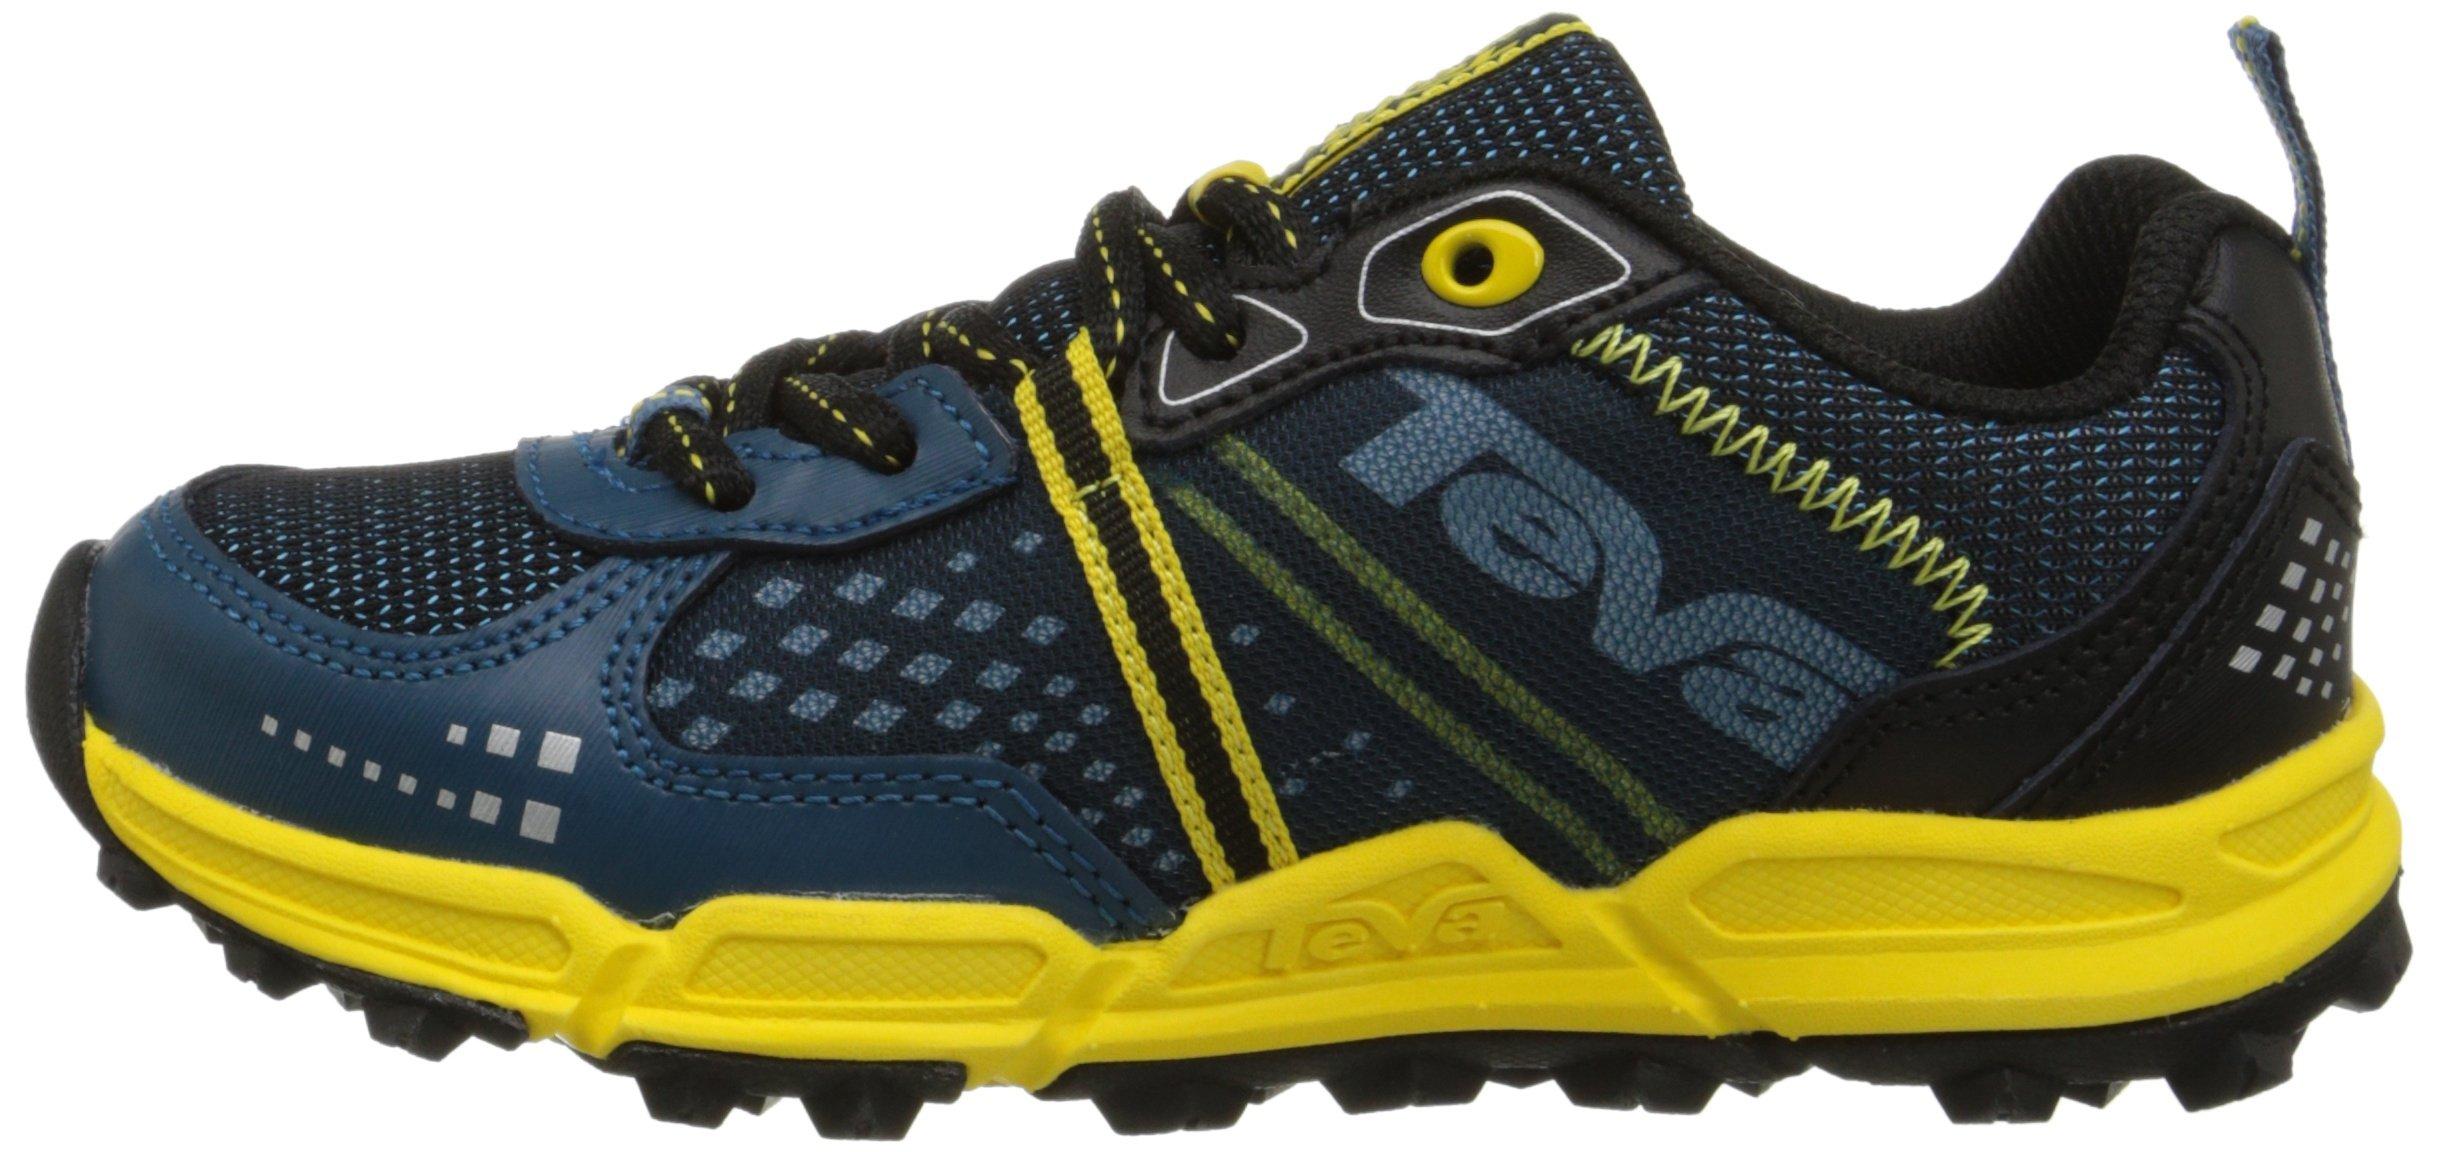 Teva Escapade Lo Athletic Trail Shoe (Little Kid/Big Kid), Blue/Yellow, 11 M US Little Kid by Teva (Image #5)